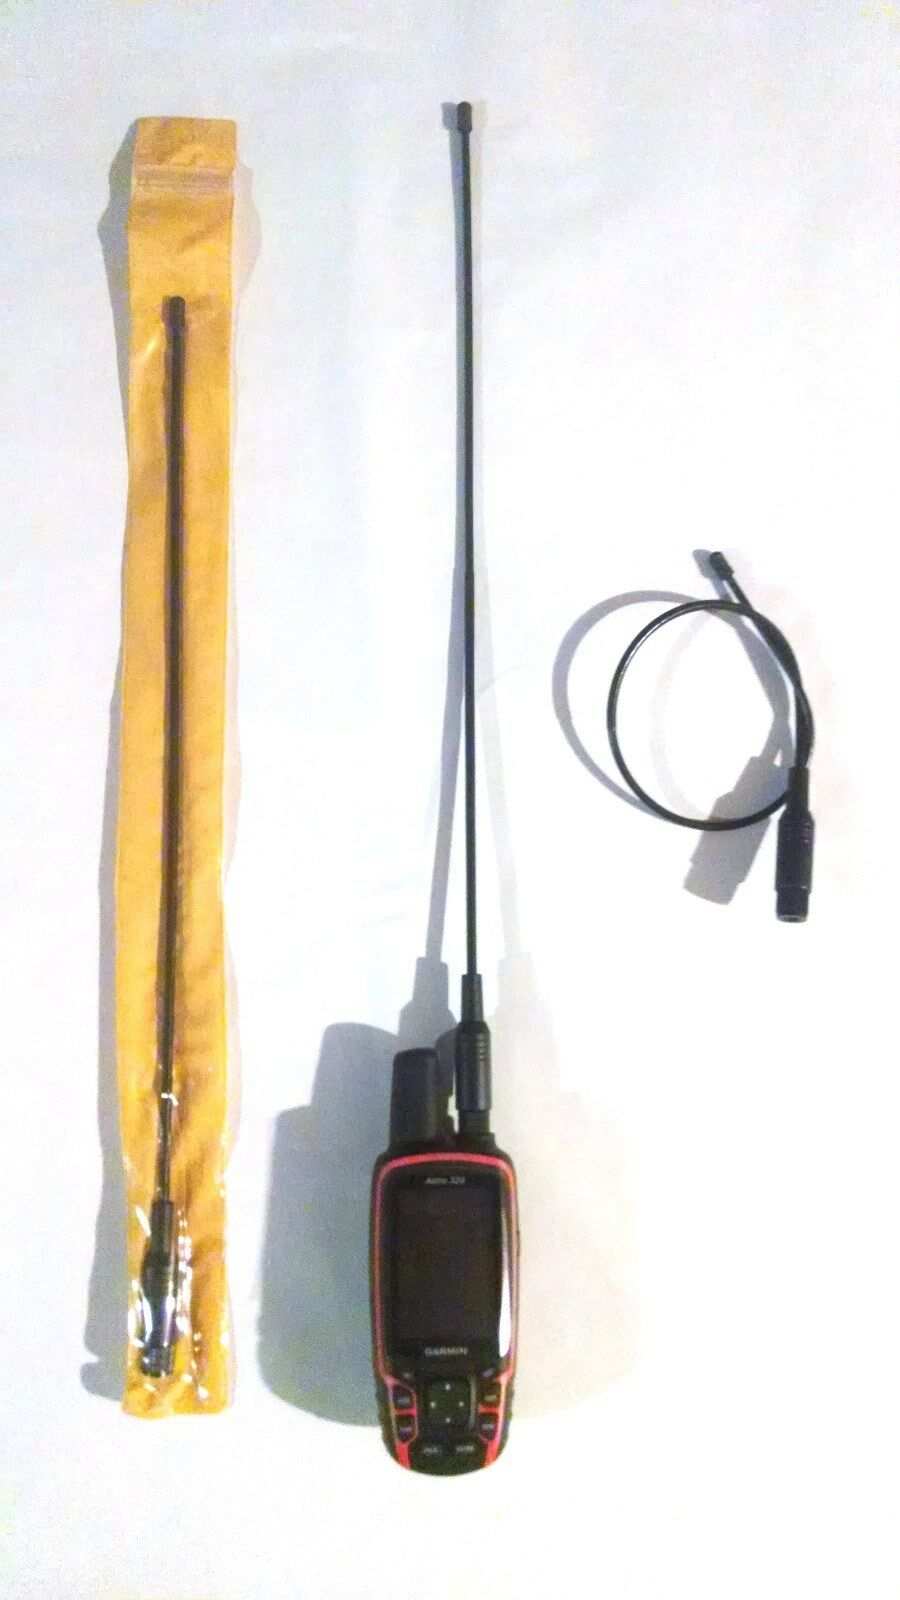 "5-20/"" Flexible Antenna for VHF Radios Long Range SMA Female Connector"